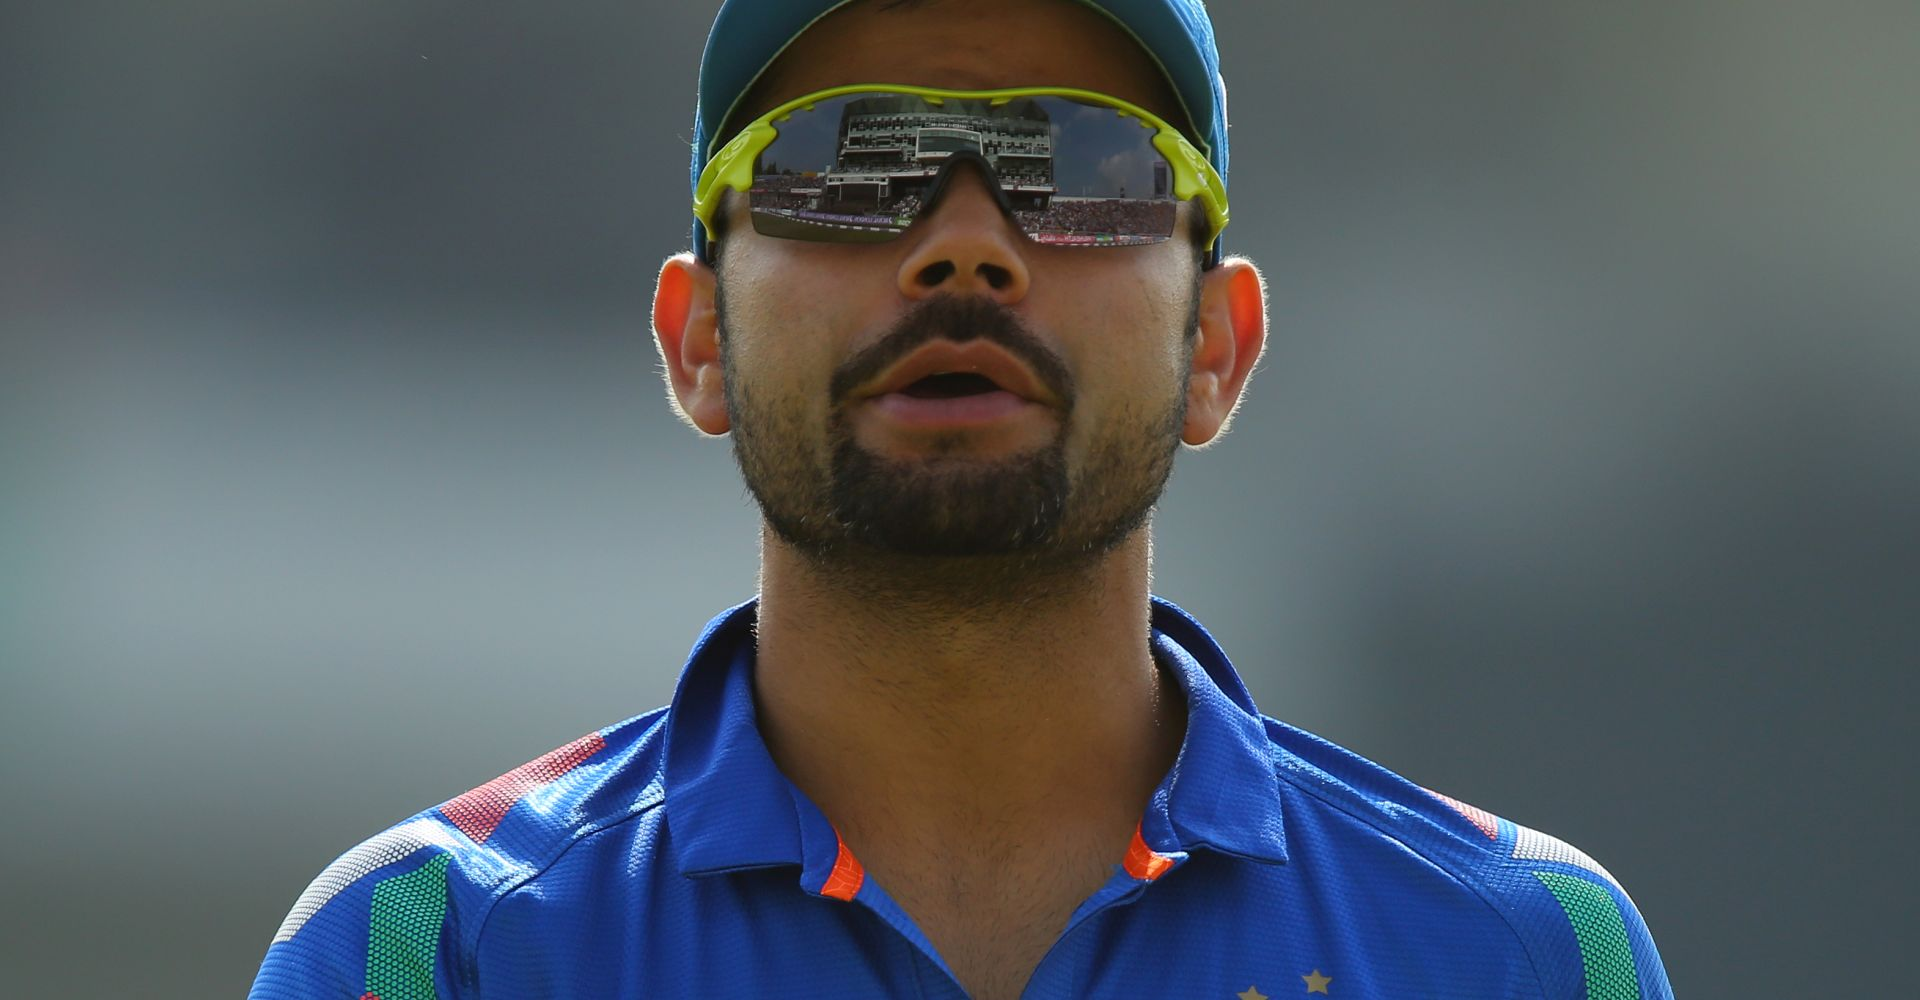 England v India 3rd ODI odds: Virat Kohli